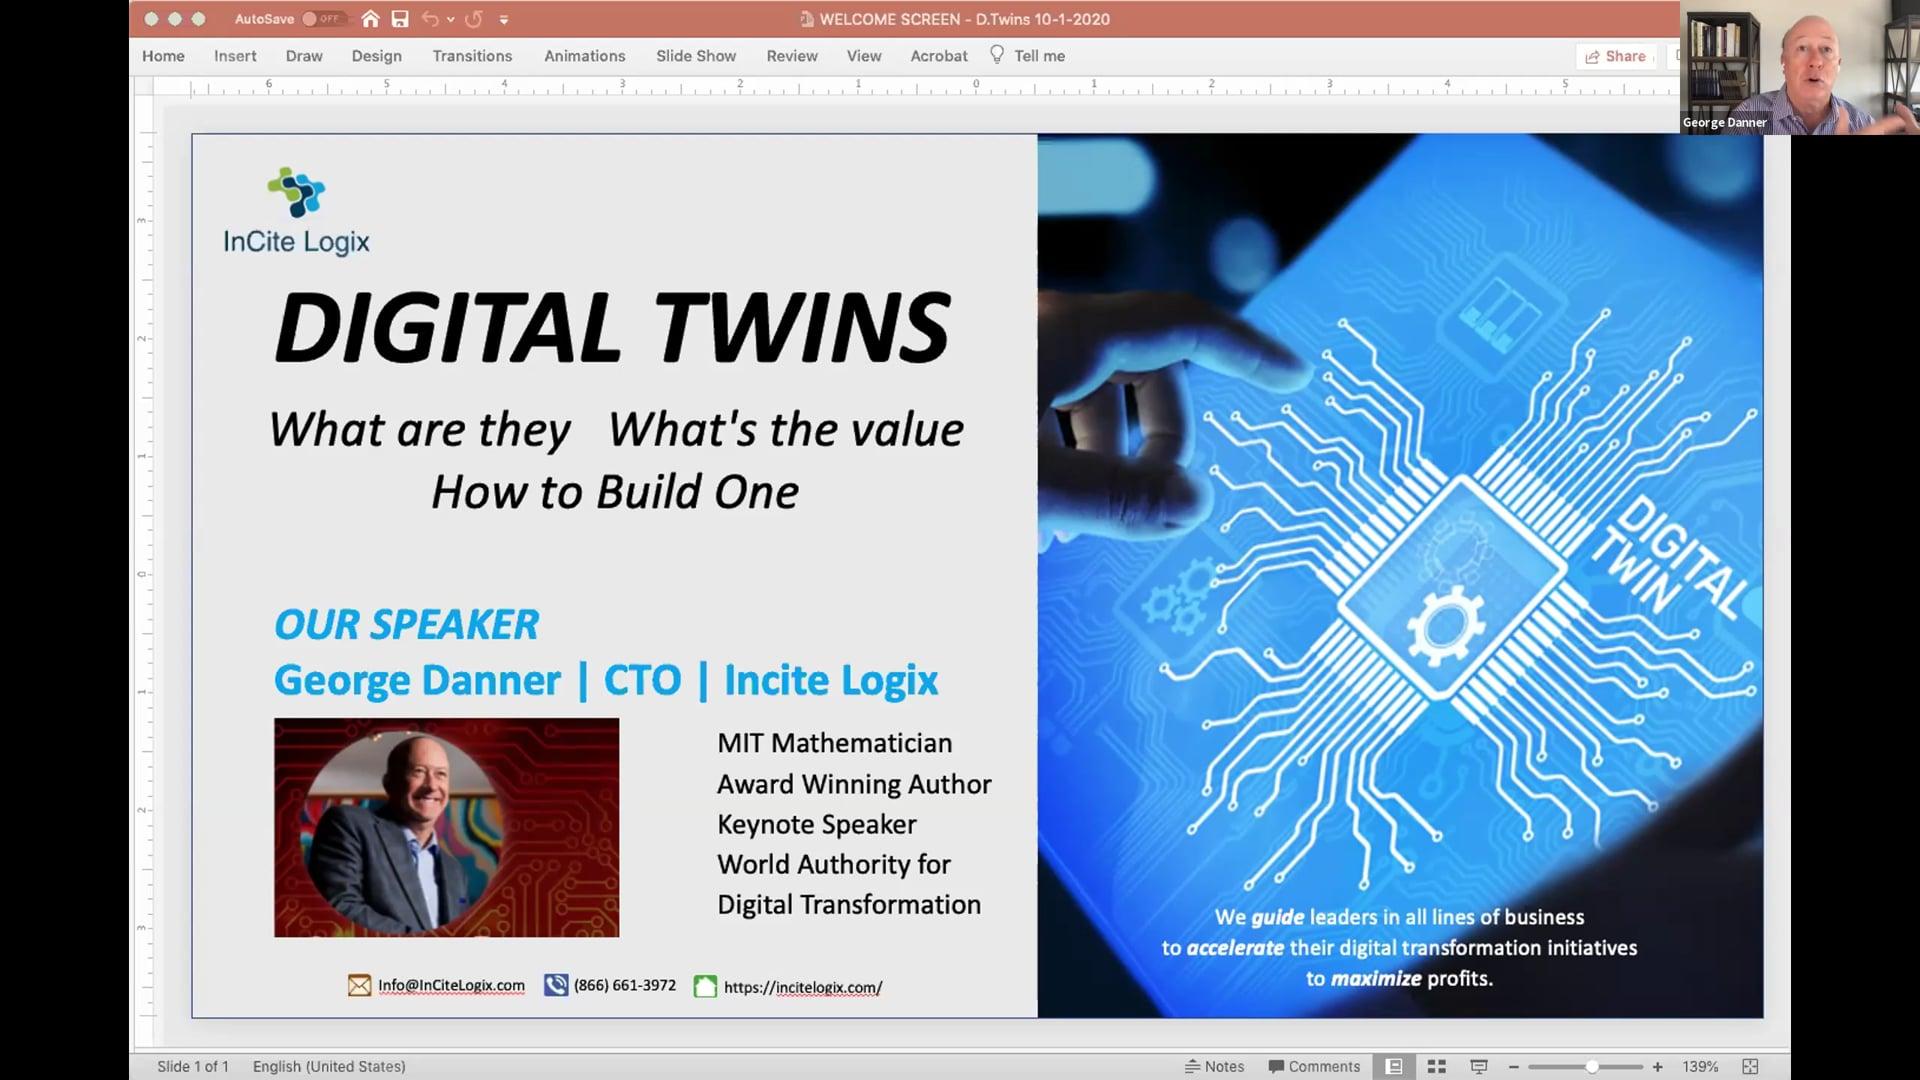 Webinar D.Twins 10-10-2020, clipped